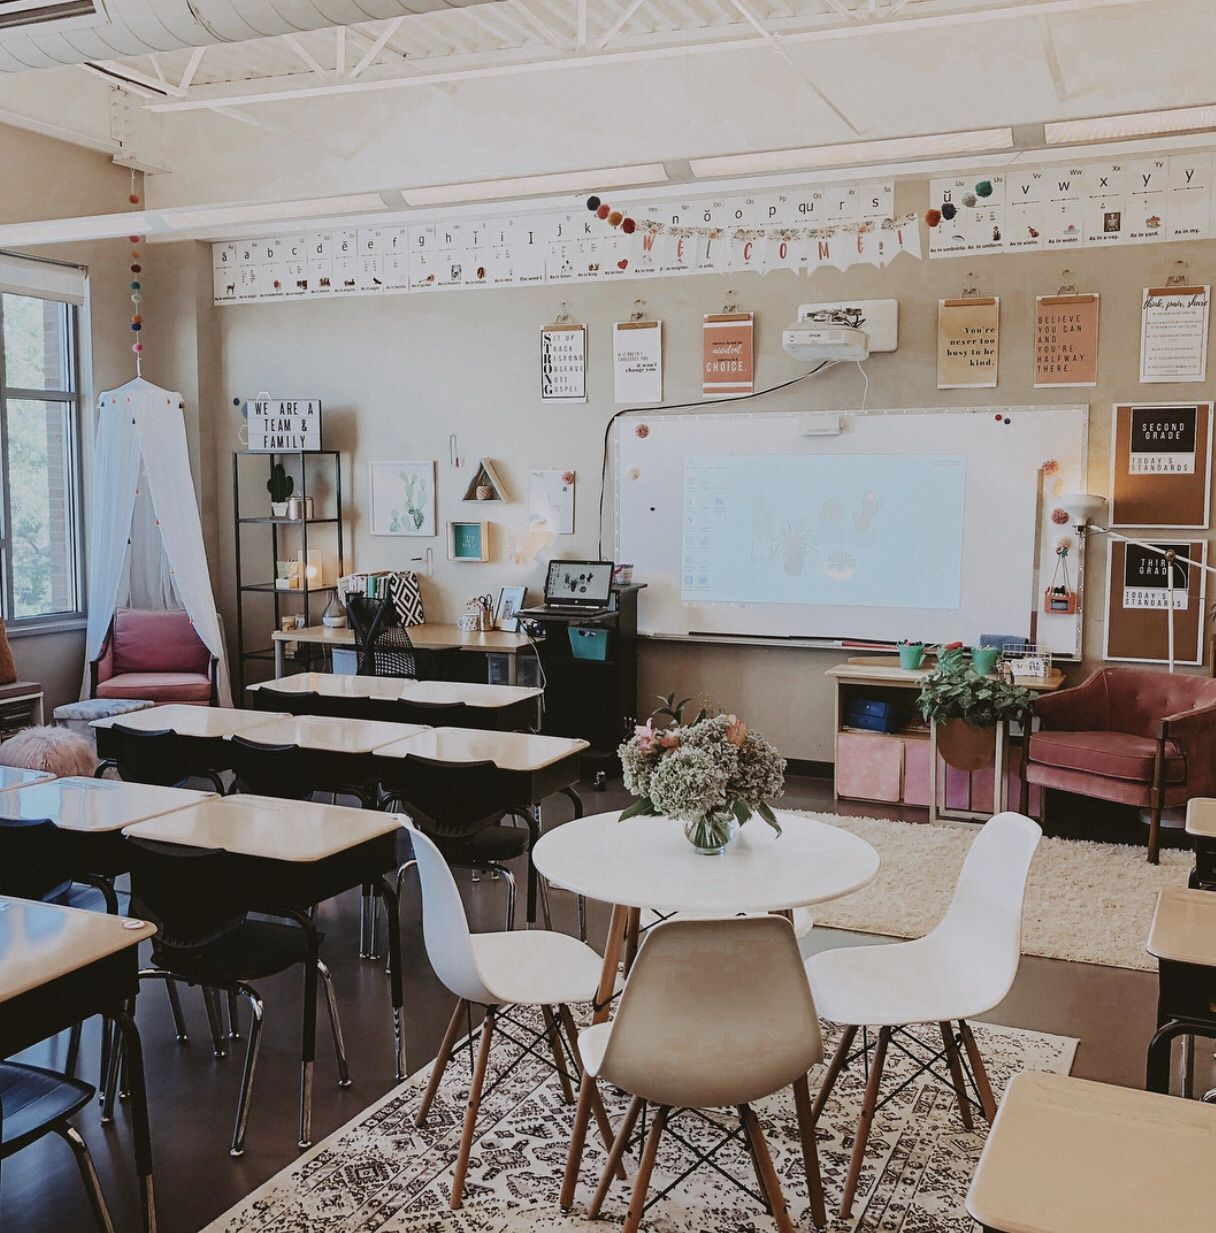 51 Best Classroom Decoration Ideas | School decor